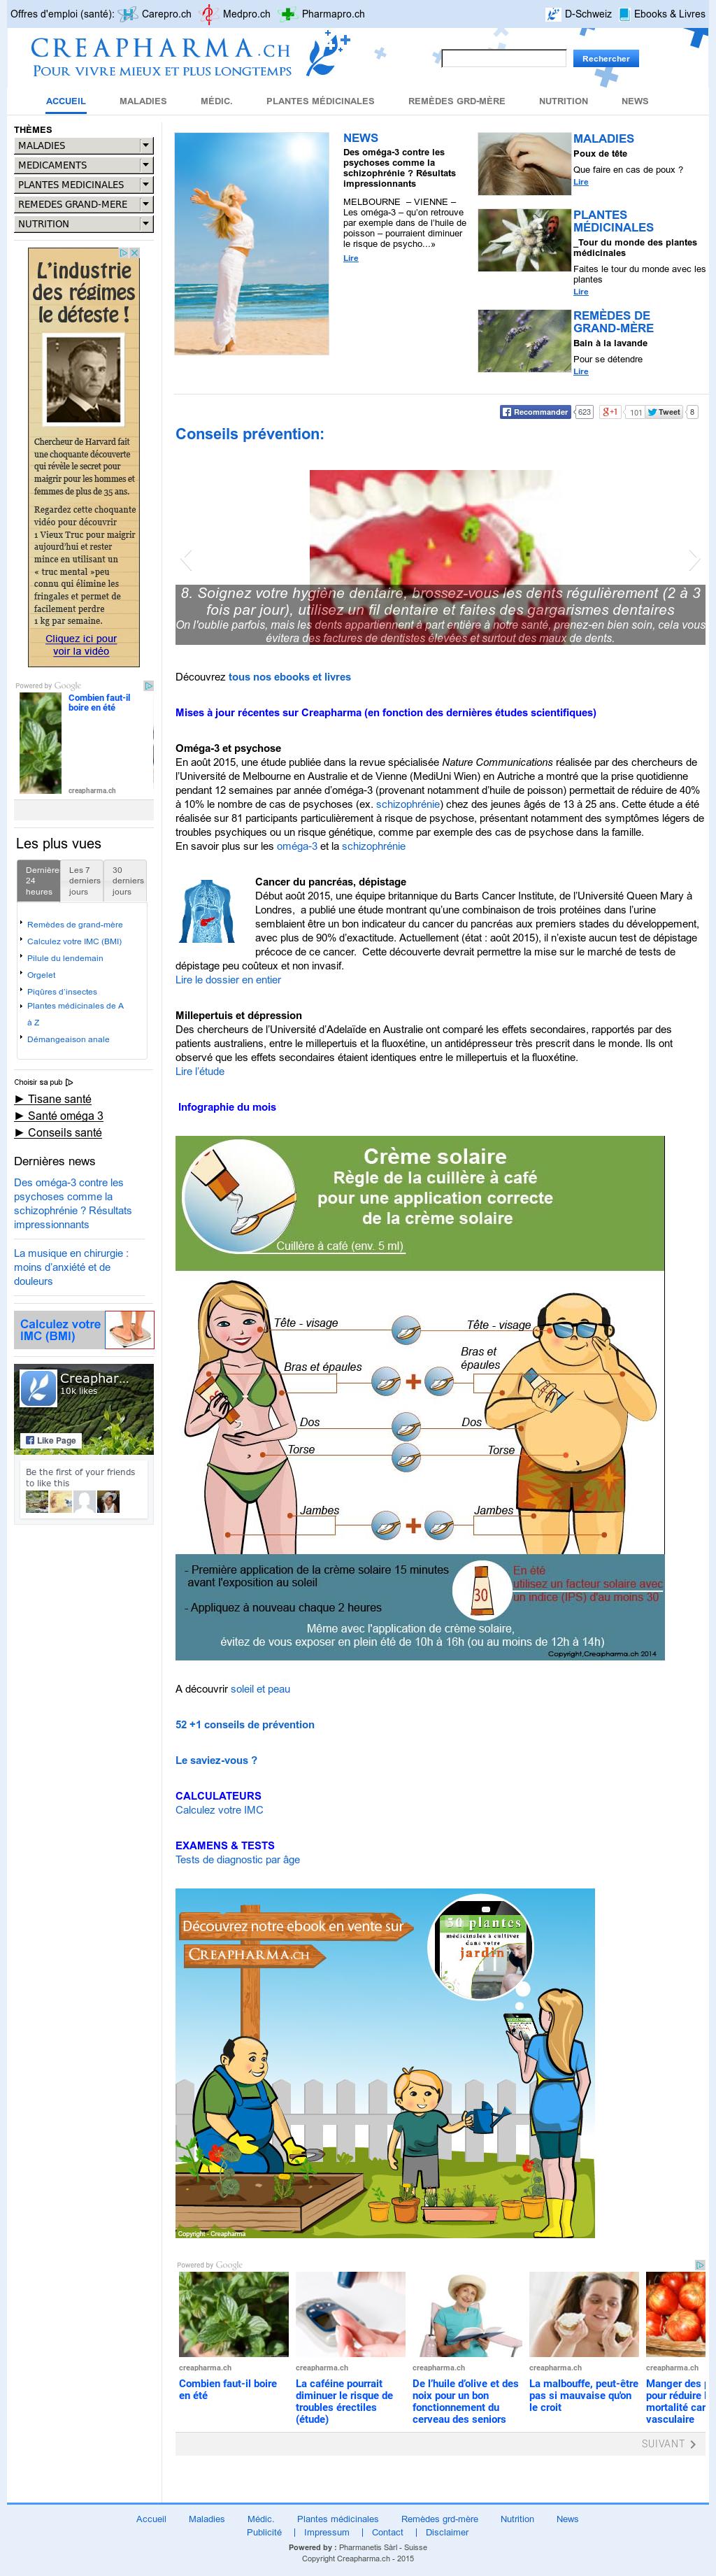 Creapharma Competitors, Revenue and Employees - Owler Company Profile 45c1eb8dd0e